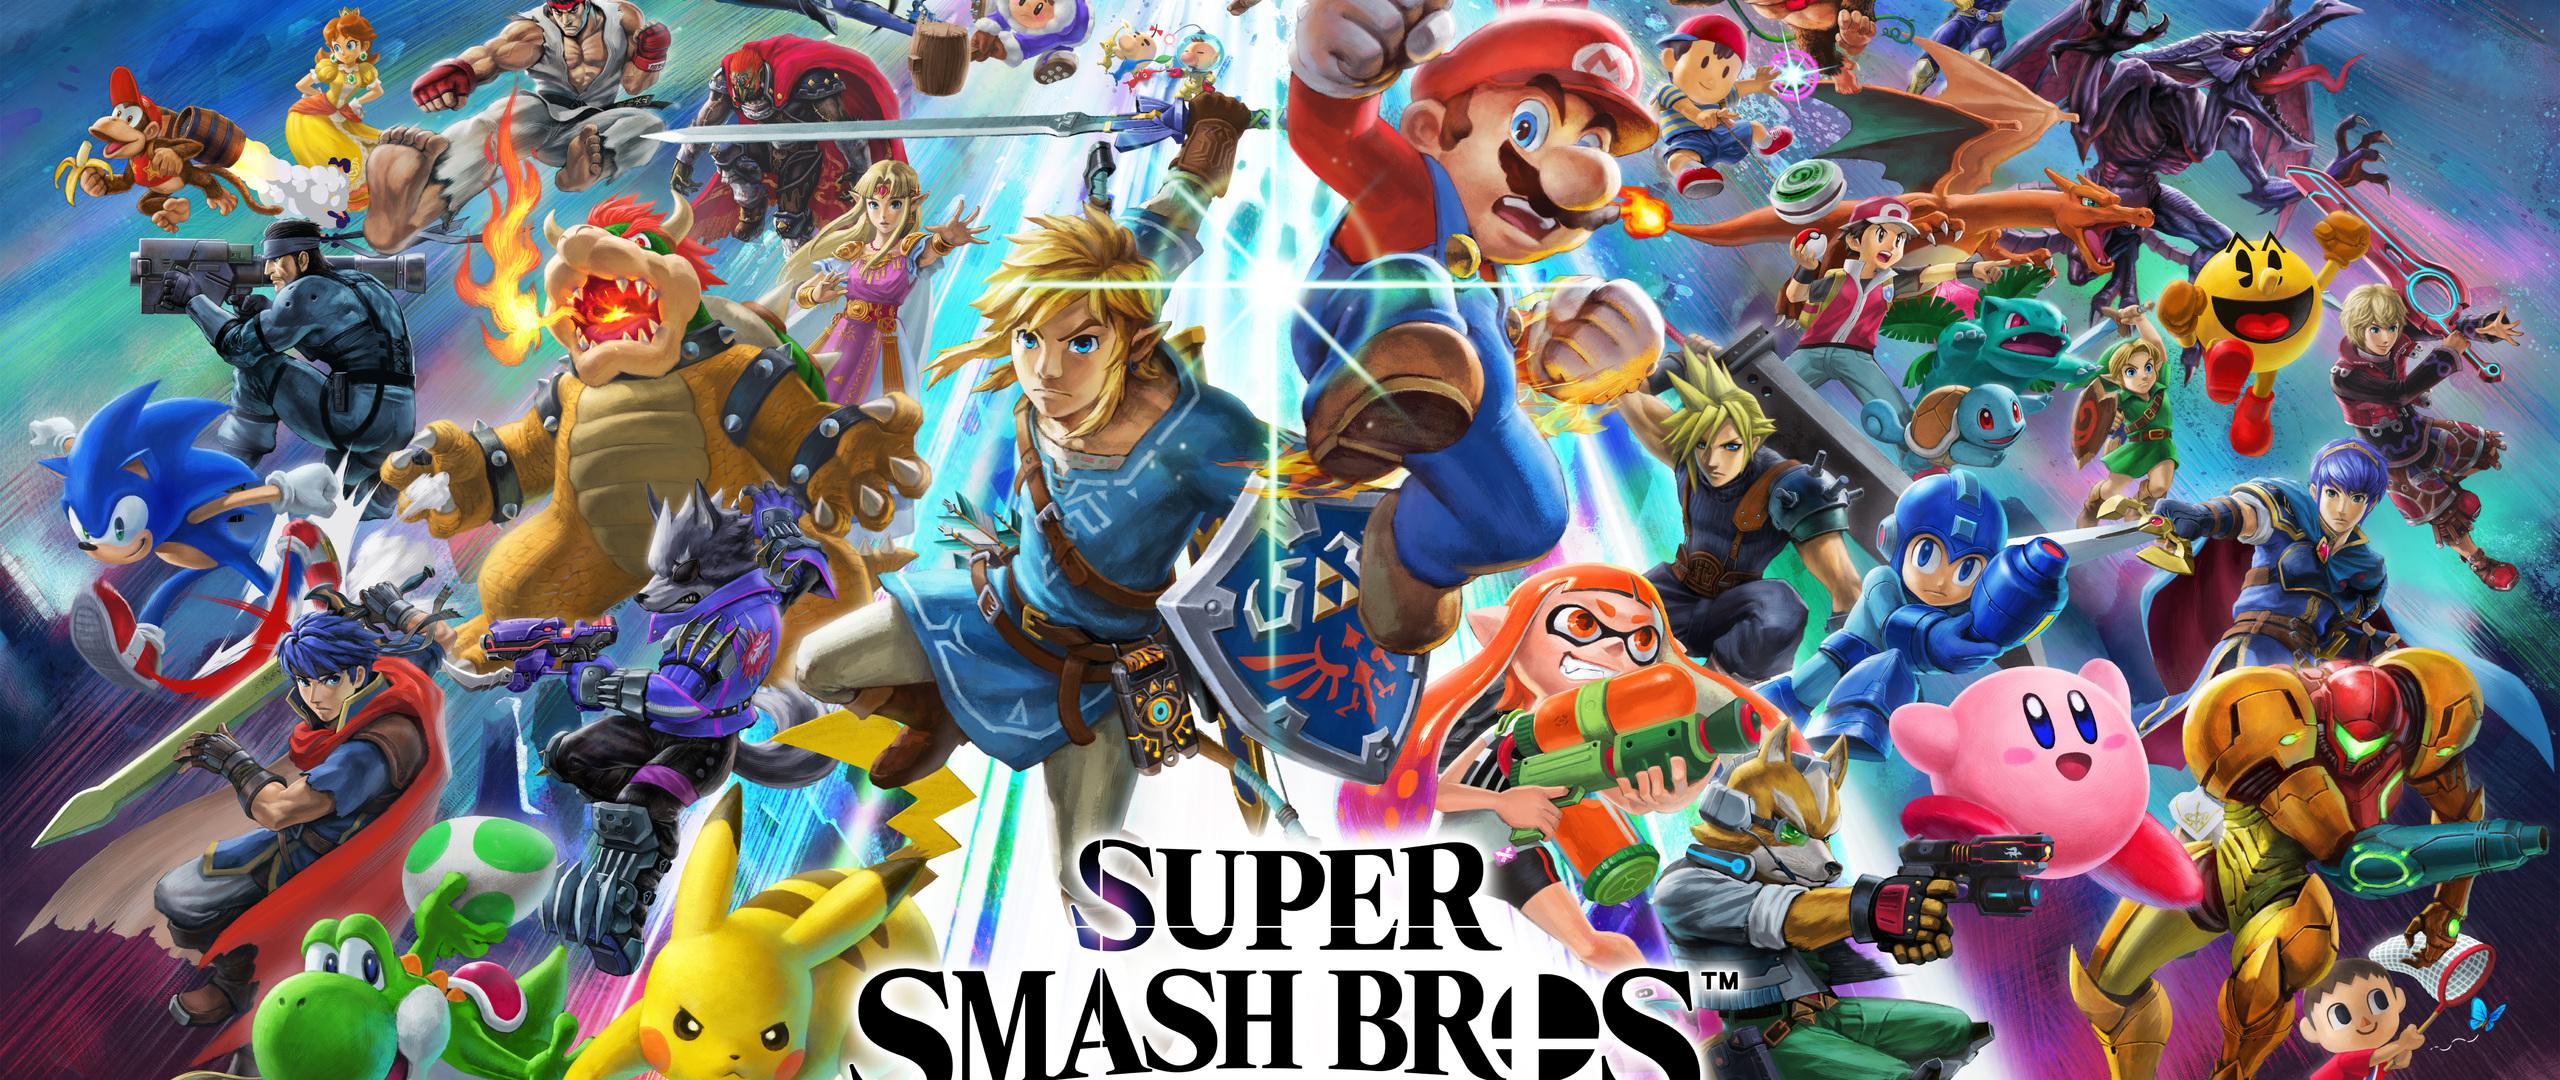 2560x1080 Super Smash Bros Ultimate 8k 2560x1080 ...